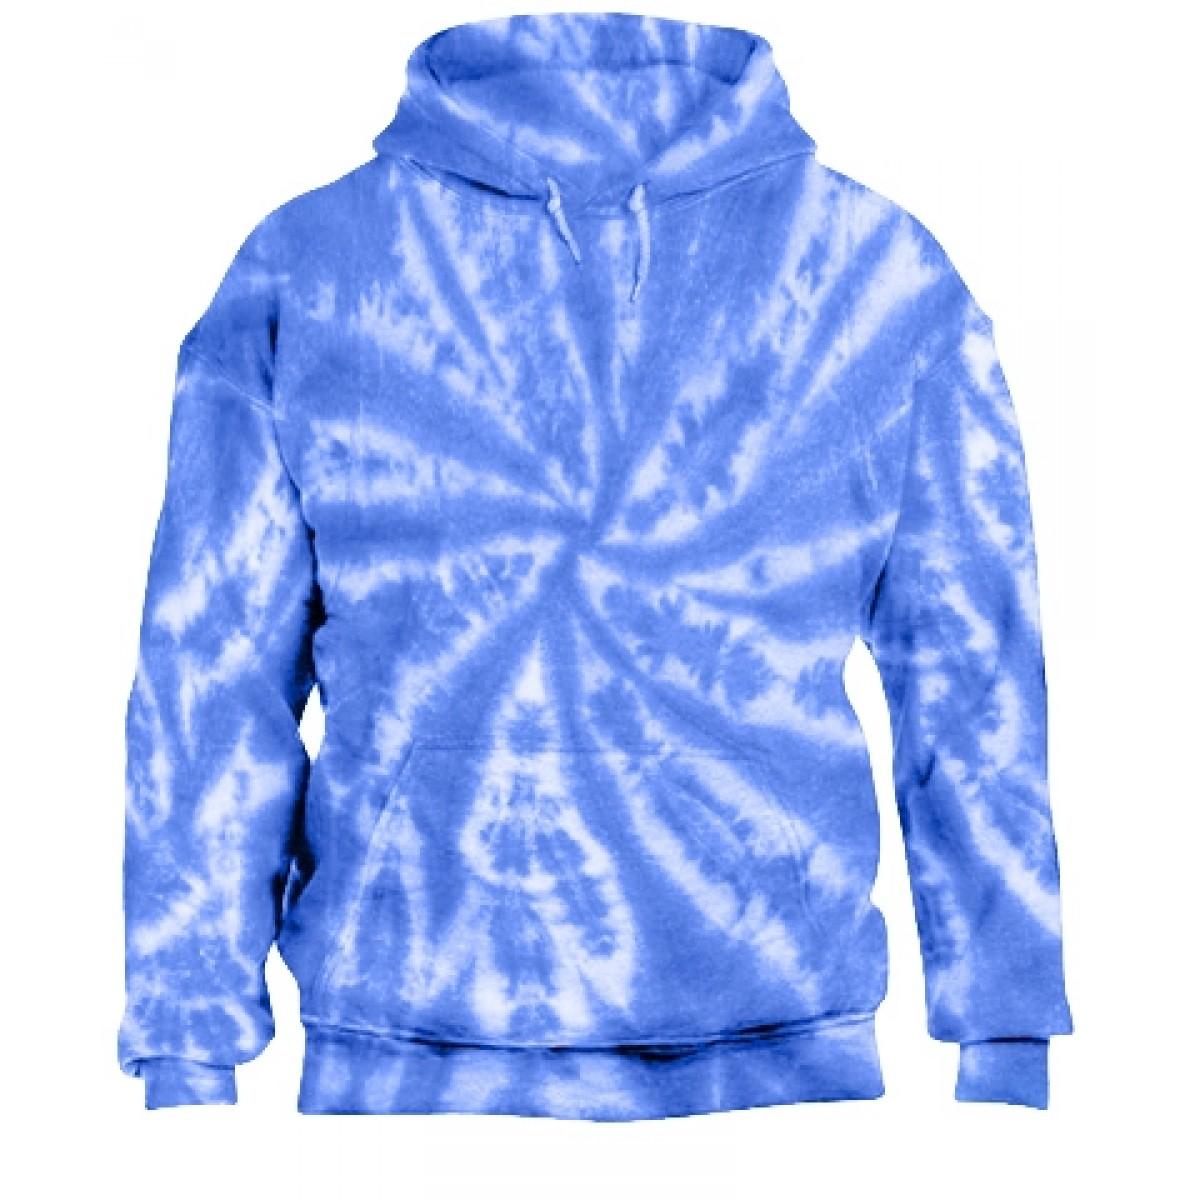 Tie-Dye Pullover Hooded Sweatshirt-Blue-M